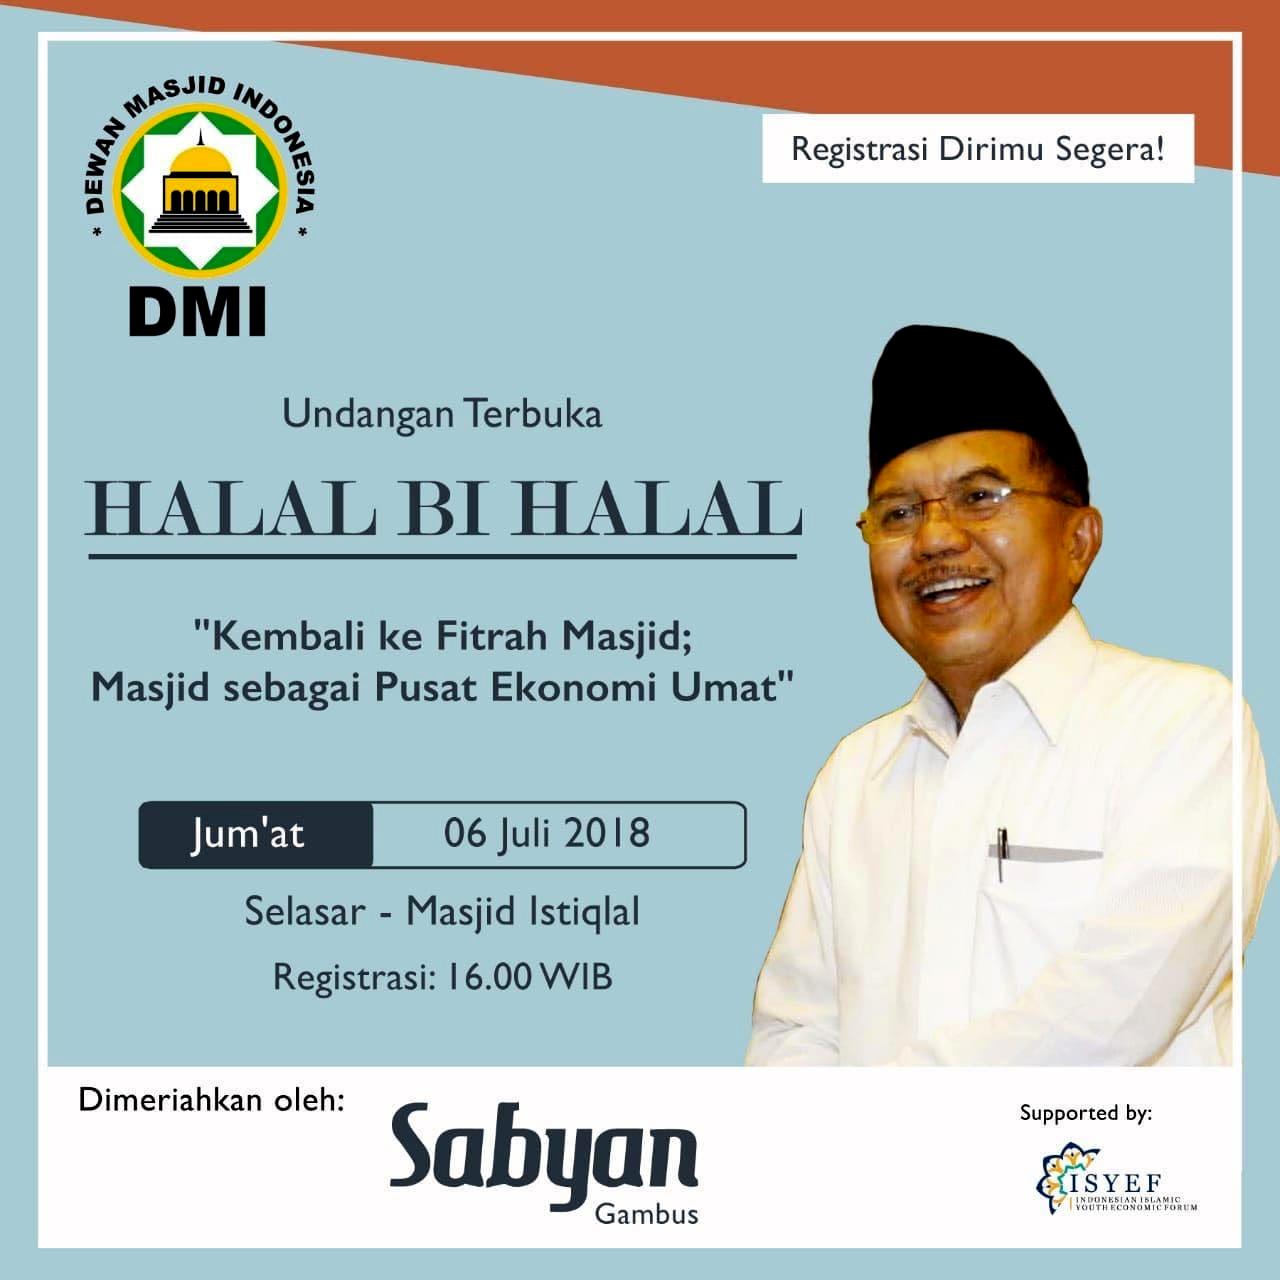 Konsolidasikan Pemakmuran Umat dan Masjid, DMI Gelar Halal Bihalal